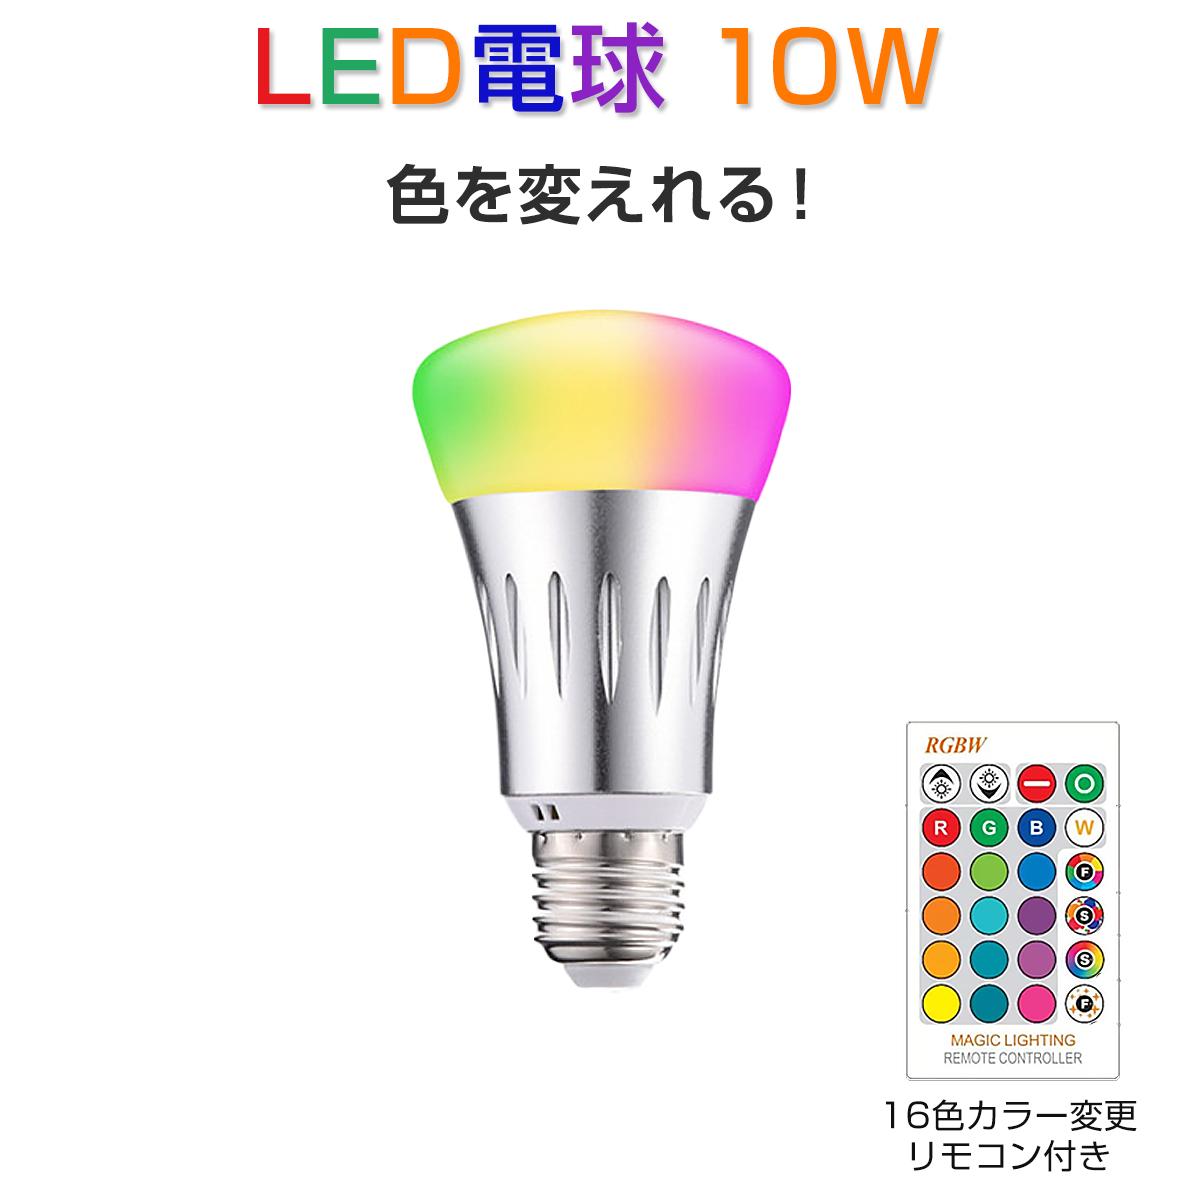 LED電球 カラー電球 E26 口金 10個セット 10W RGB 16色 リモコン操作 調光 調色 眼精疲労 睡眠障害 省エネ 節電対策 長寿命 高輝度 送料無料 1ヶ月保証 K&M